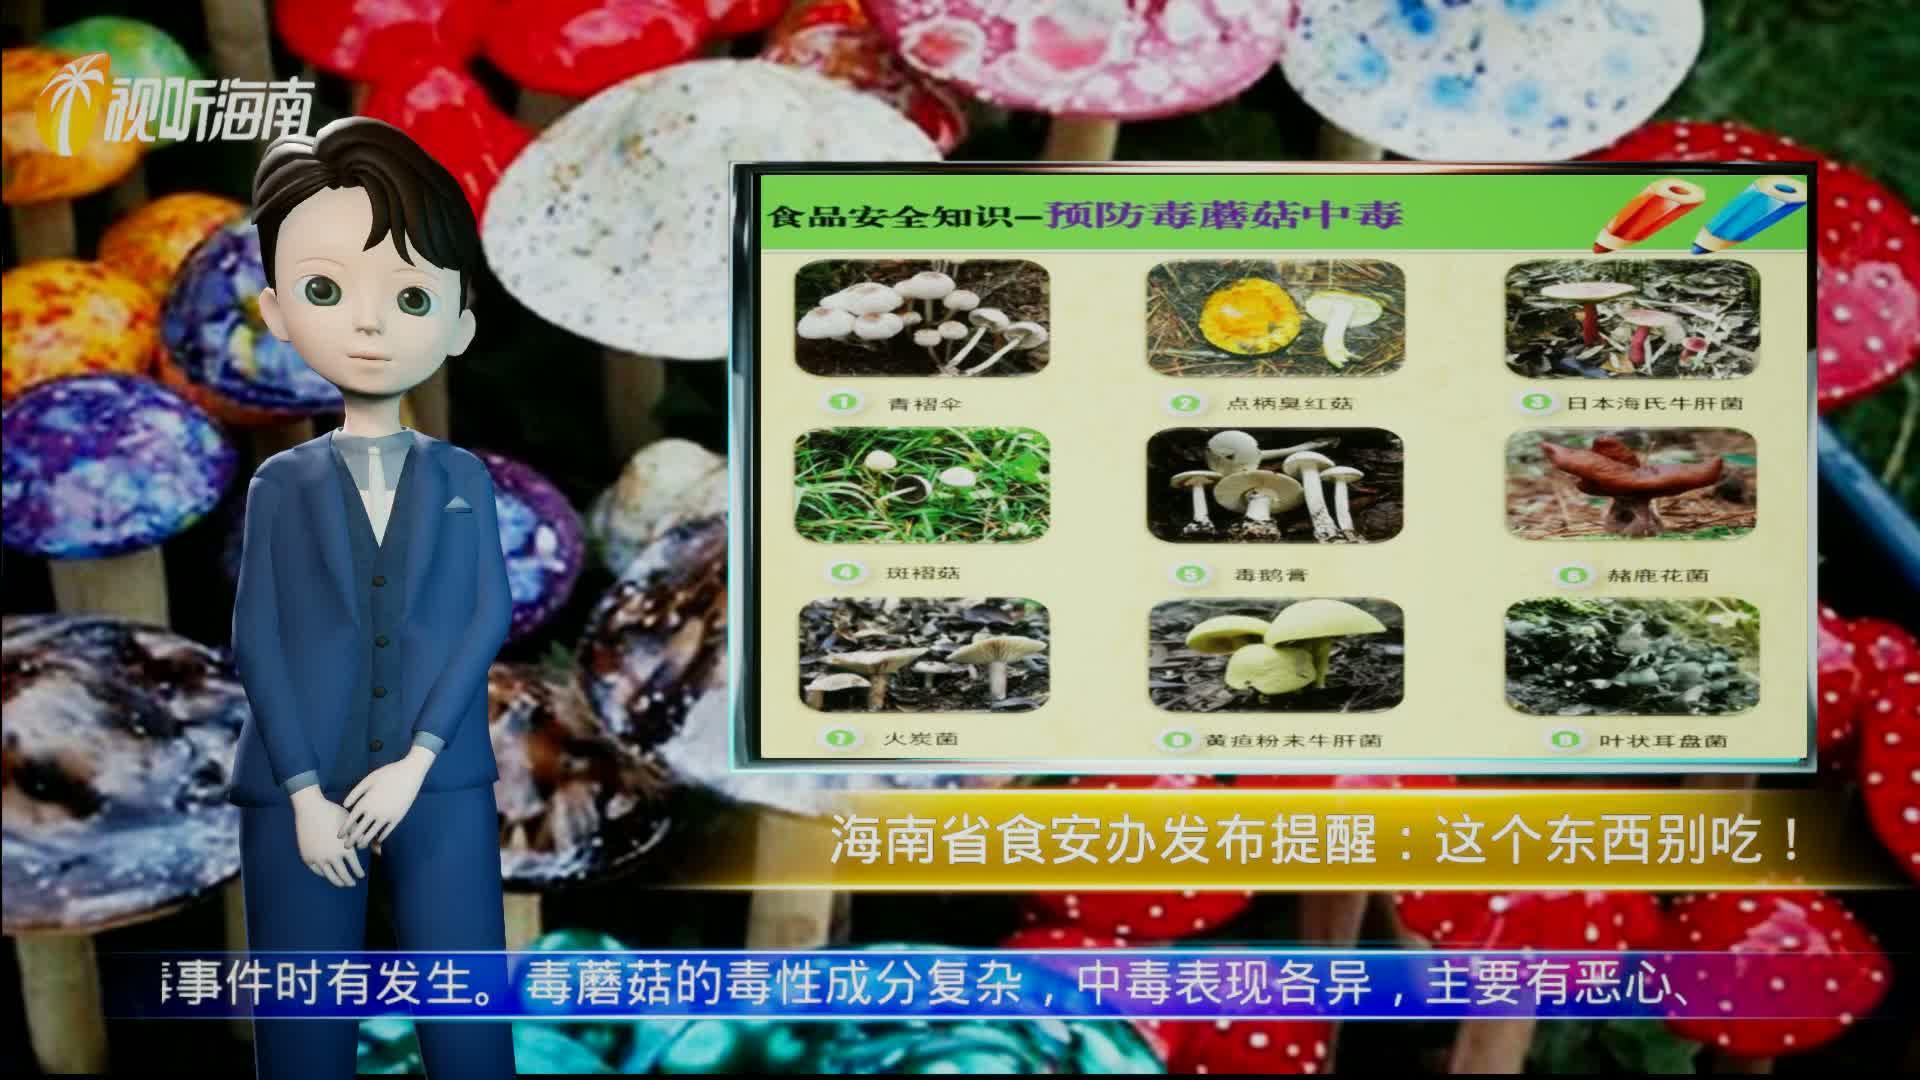 AI播报|海南省食安办发布提醒:这个东西别吃!